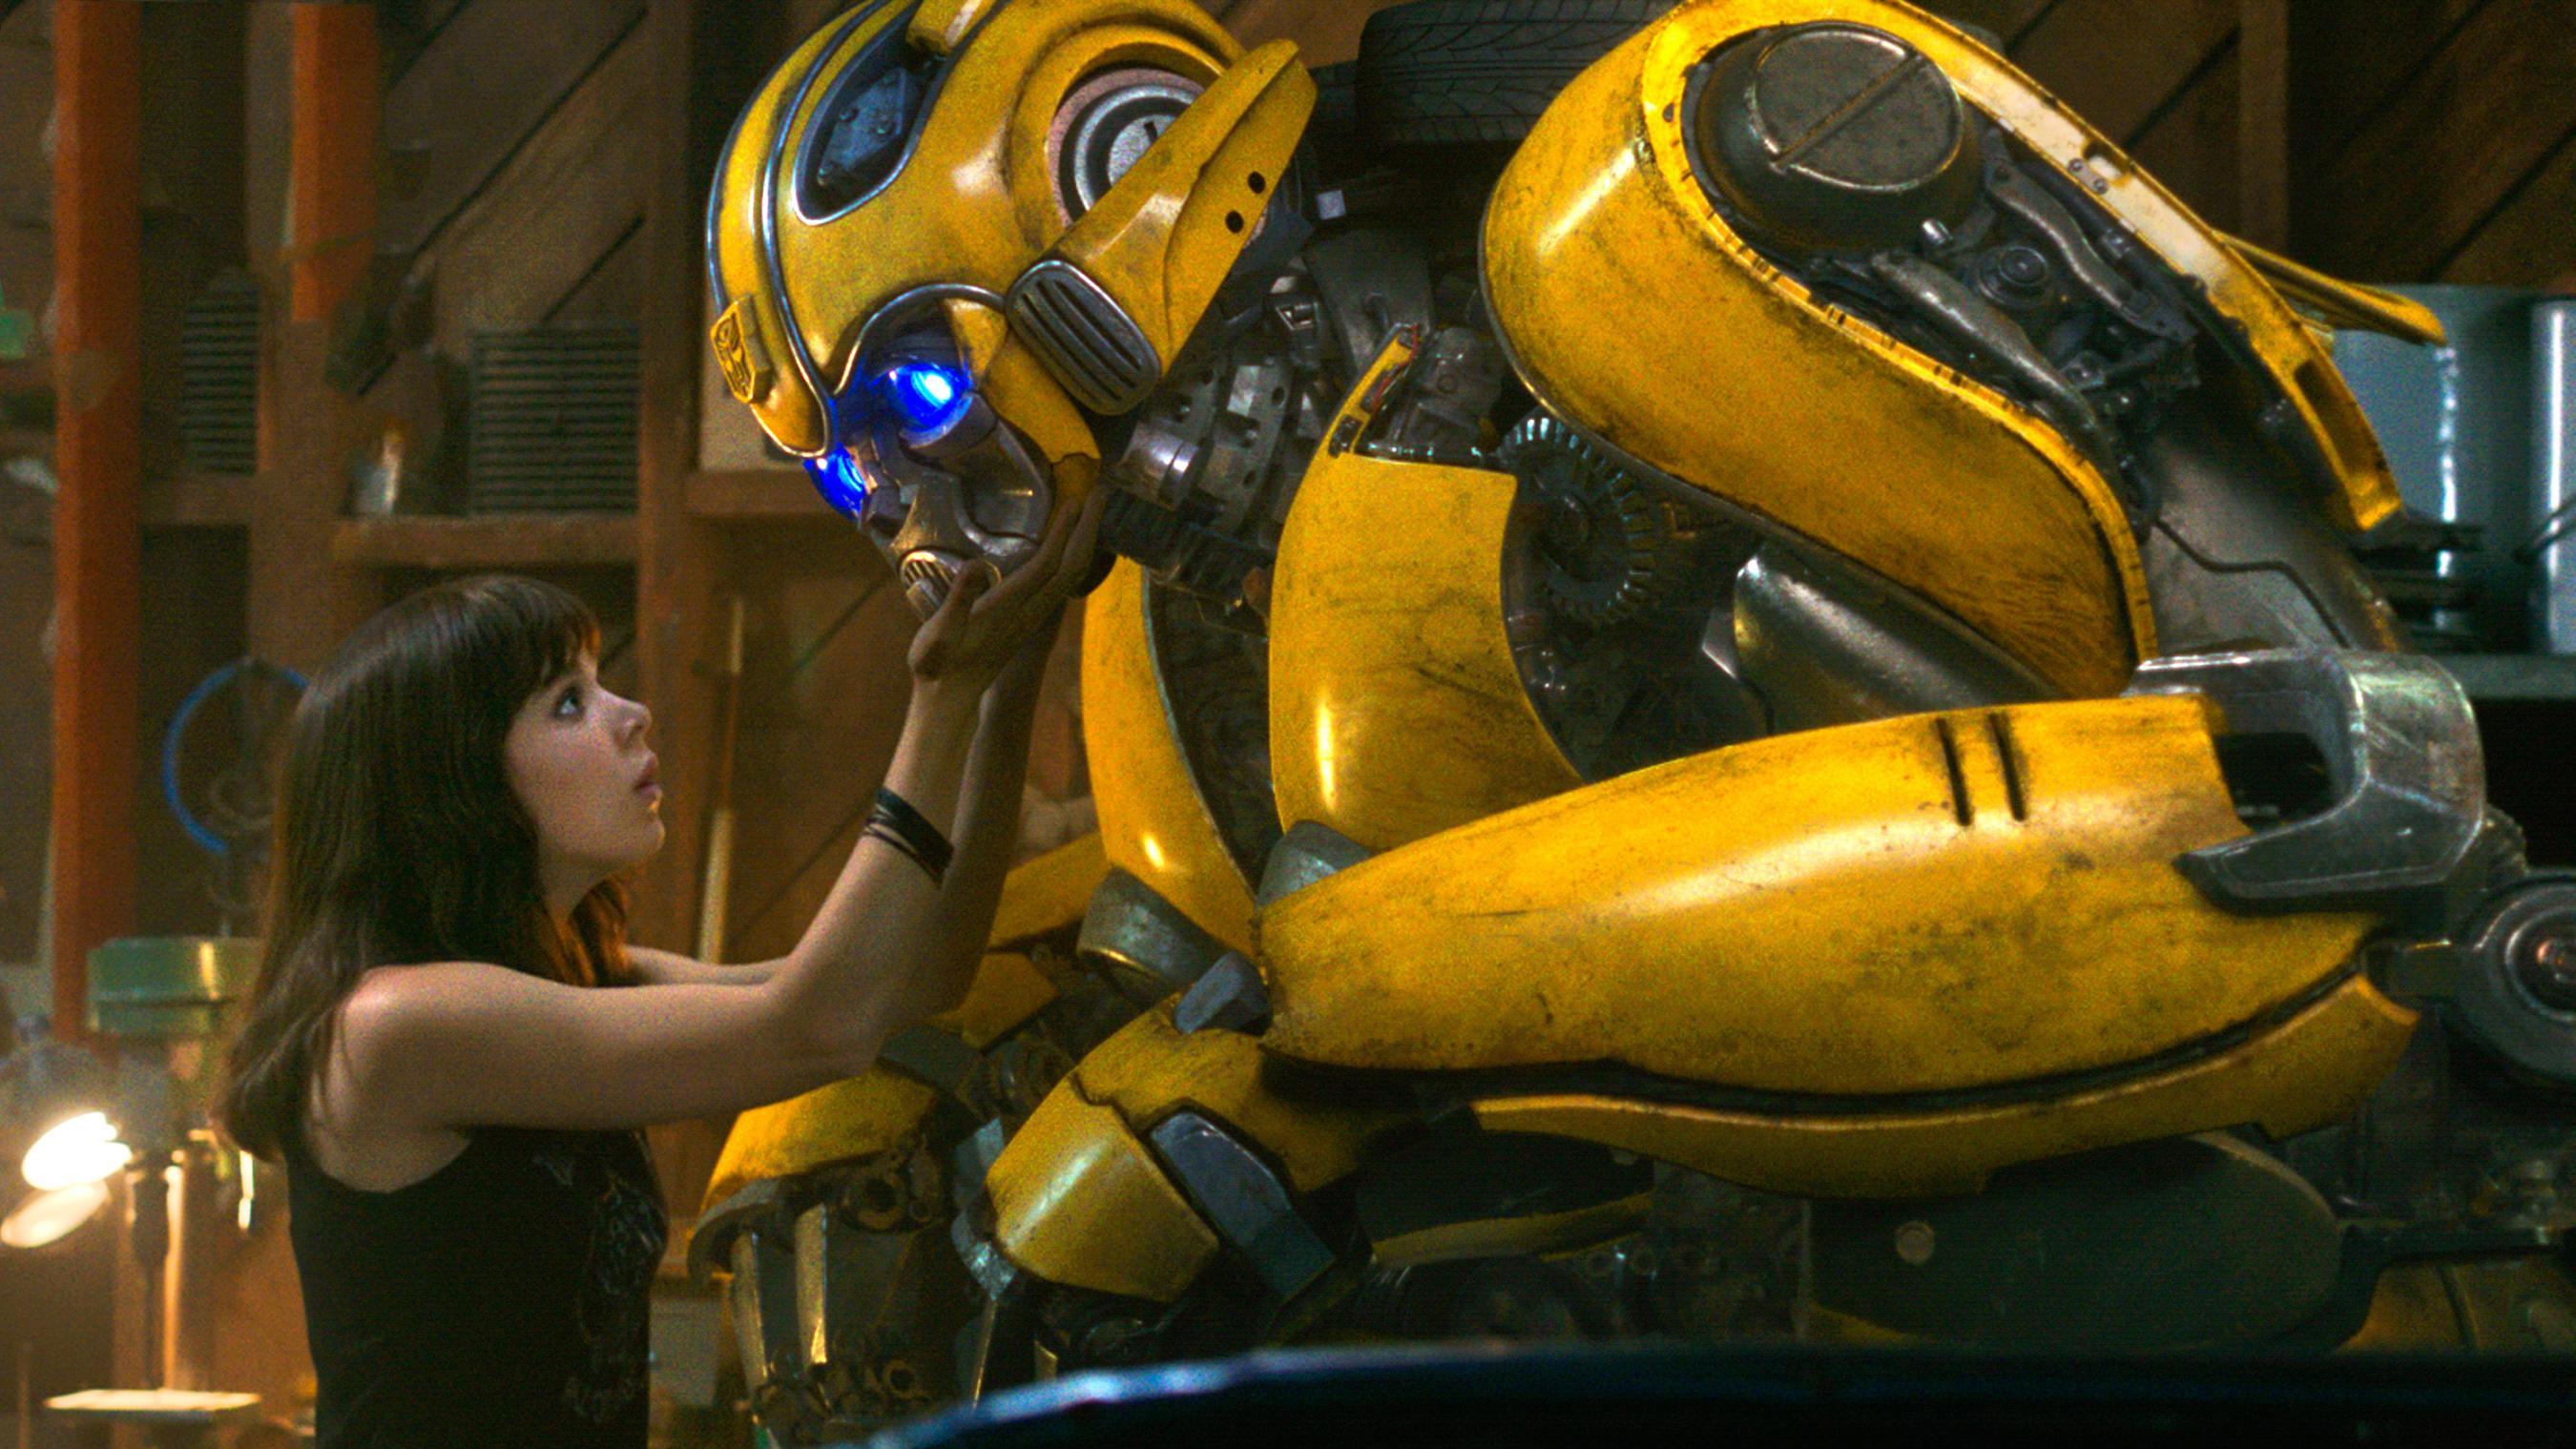 Bumblebee Movie Wallpapers Top Free Bumblebee Movie Backgrounds